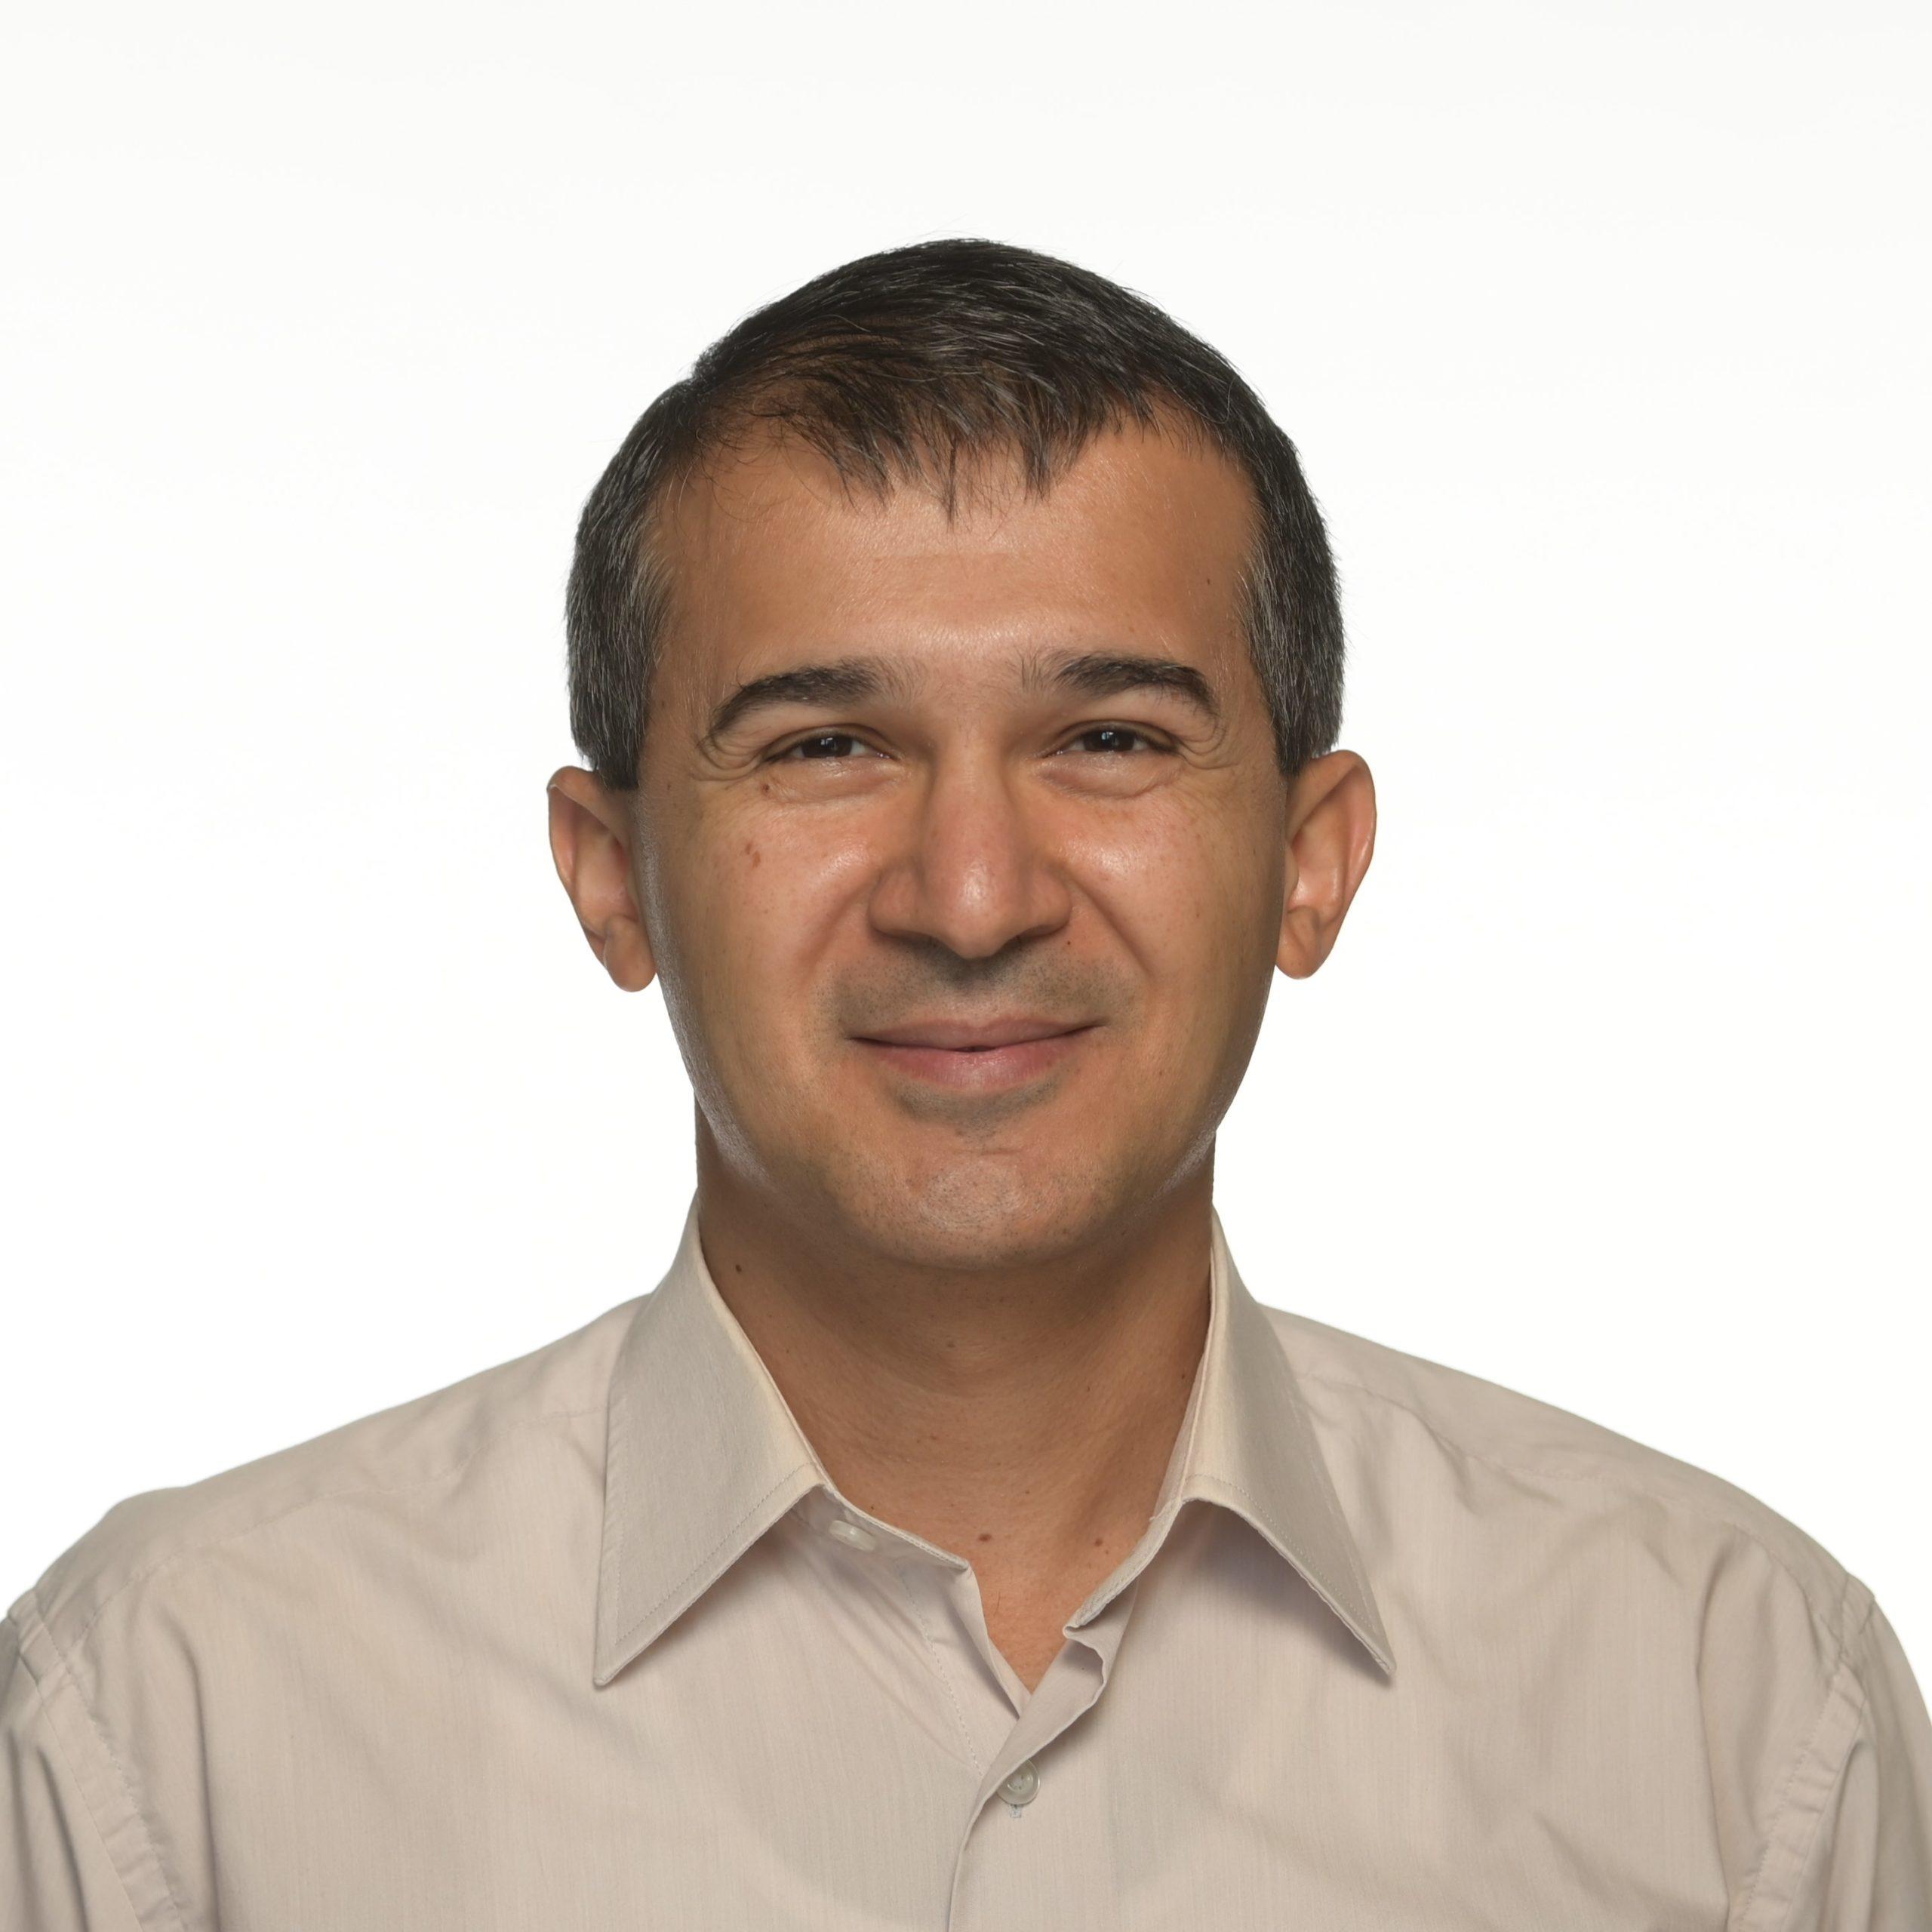 Mustafa Bilgic<br><span>Associate Professor; Dir. of ML Laboratory in the Computer Science Department (IIT)</span>